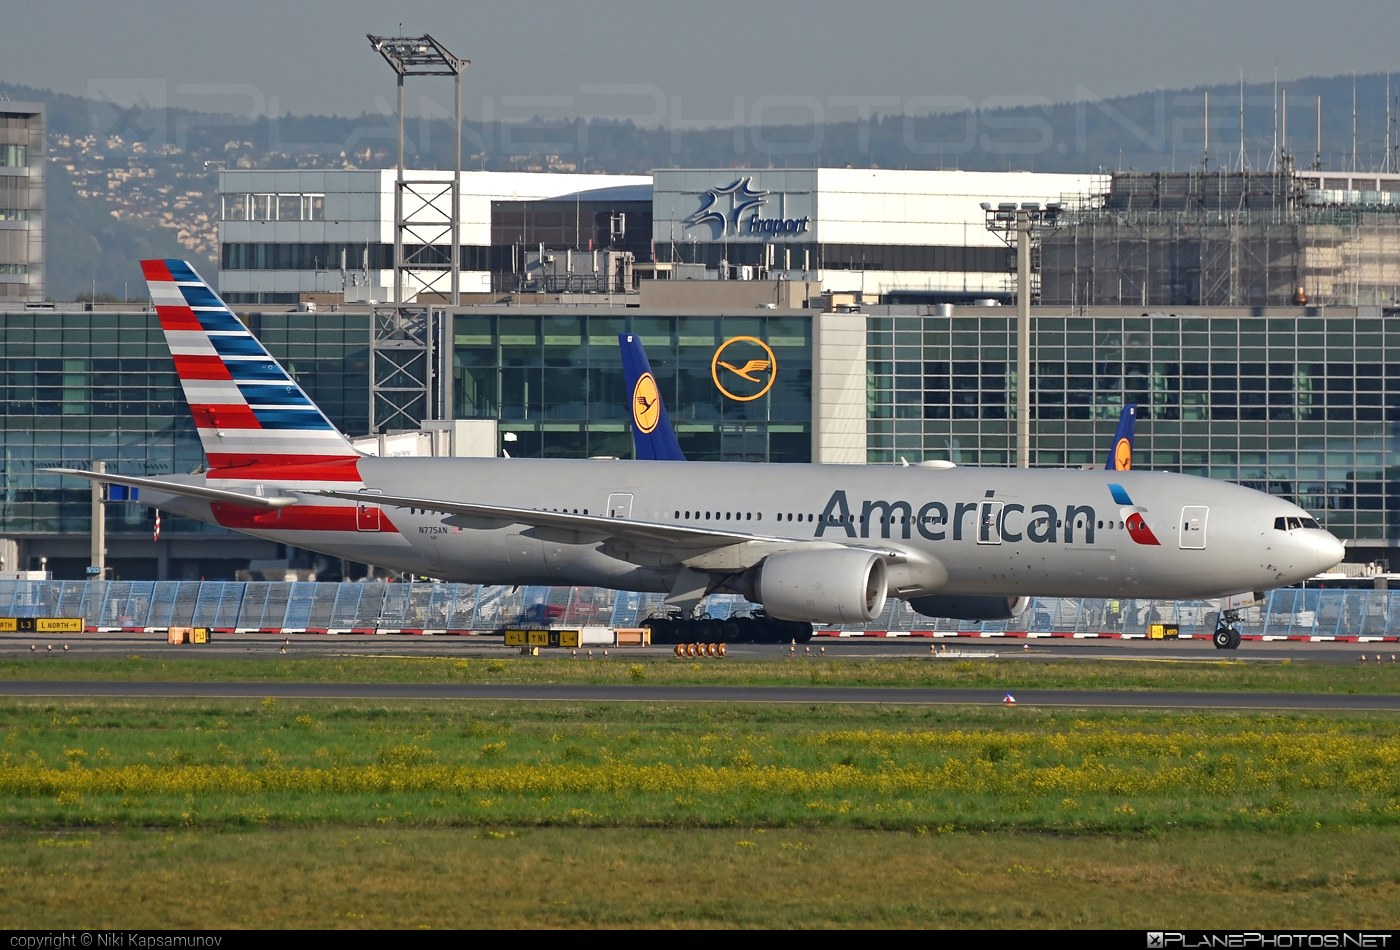 American Airlines Boeing 777-200ER - N775AN #americanairlines #b777 #b777er #boeing #boeing777 #tripleseven